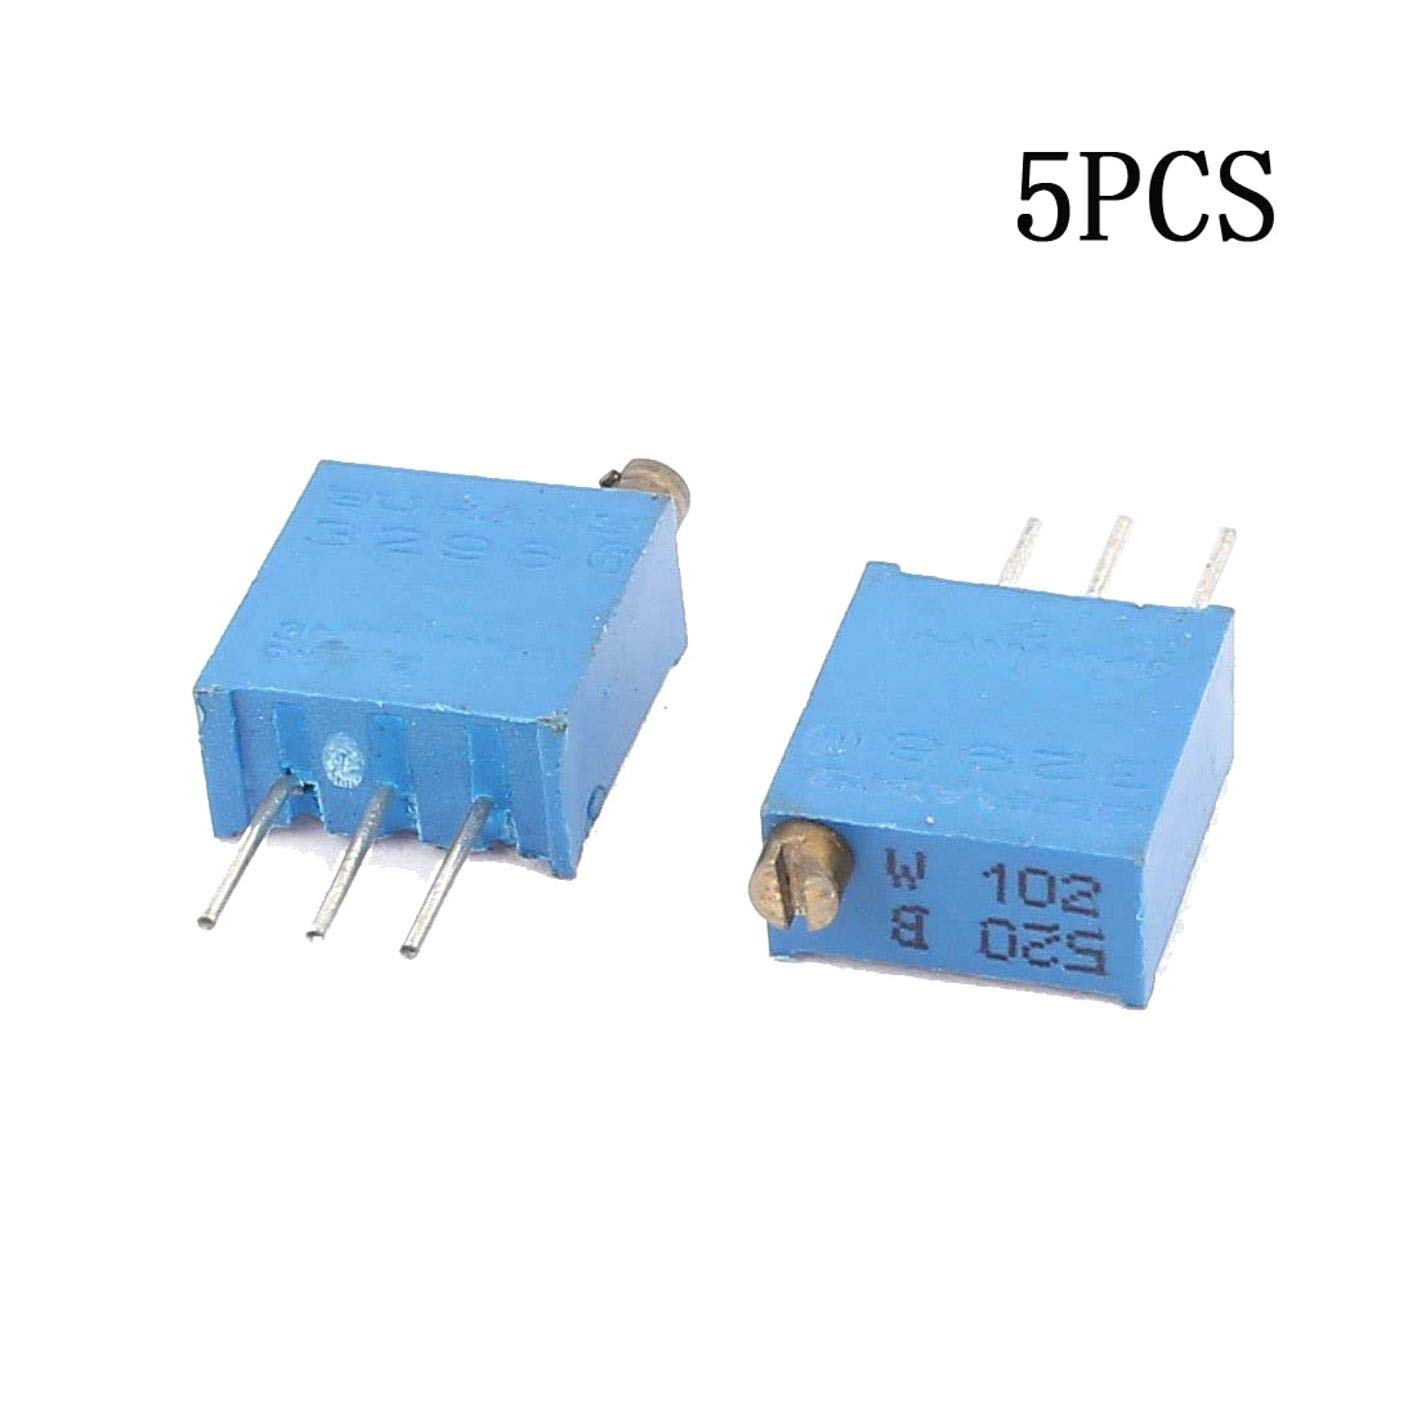 10 Pcs 3296W-102 0.5W 1K ohm Trimming Cermet Potentiometer Adjustable Resistors